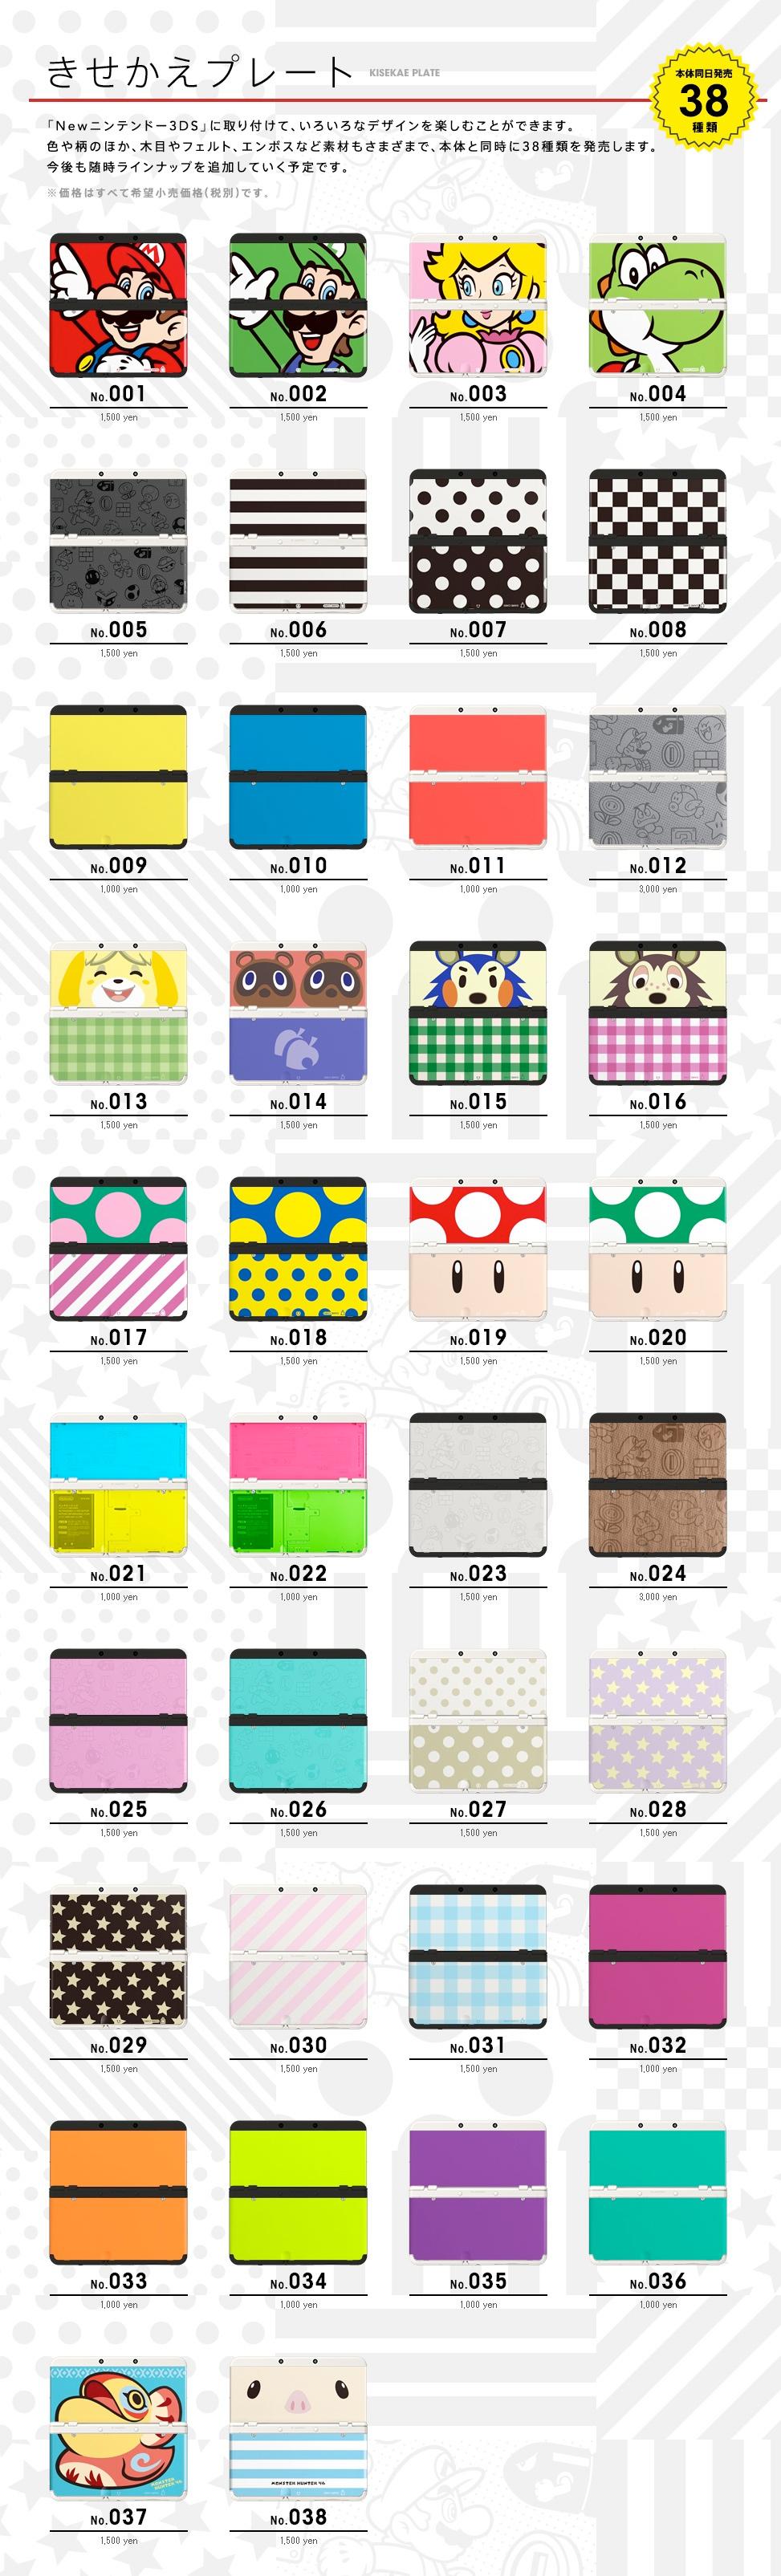 new-nintendo-3DS-kisekae-plate